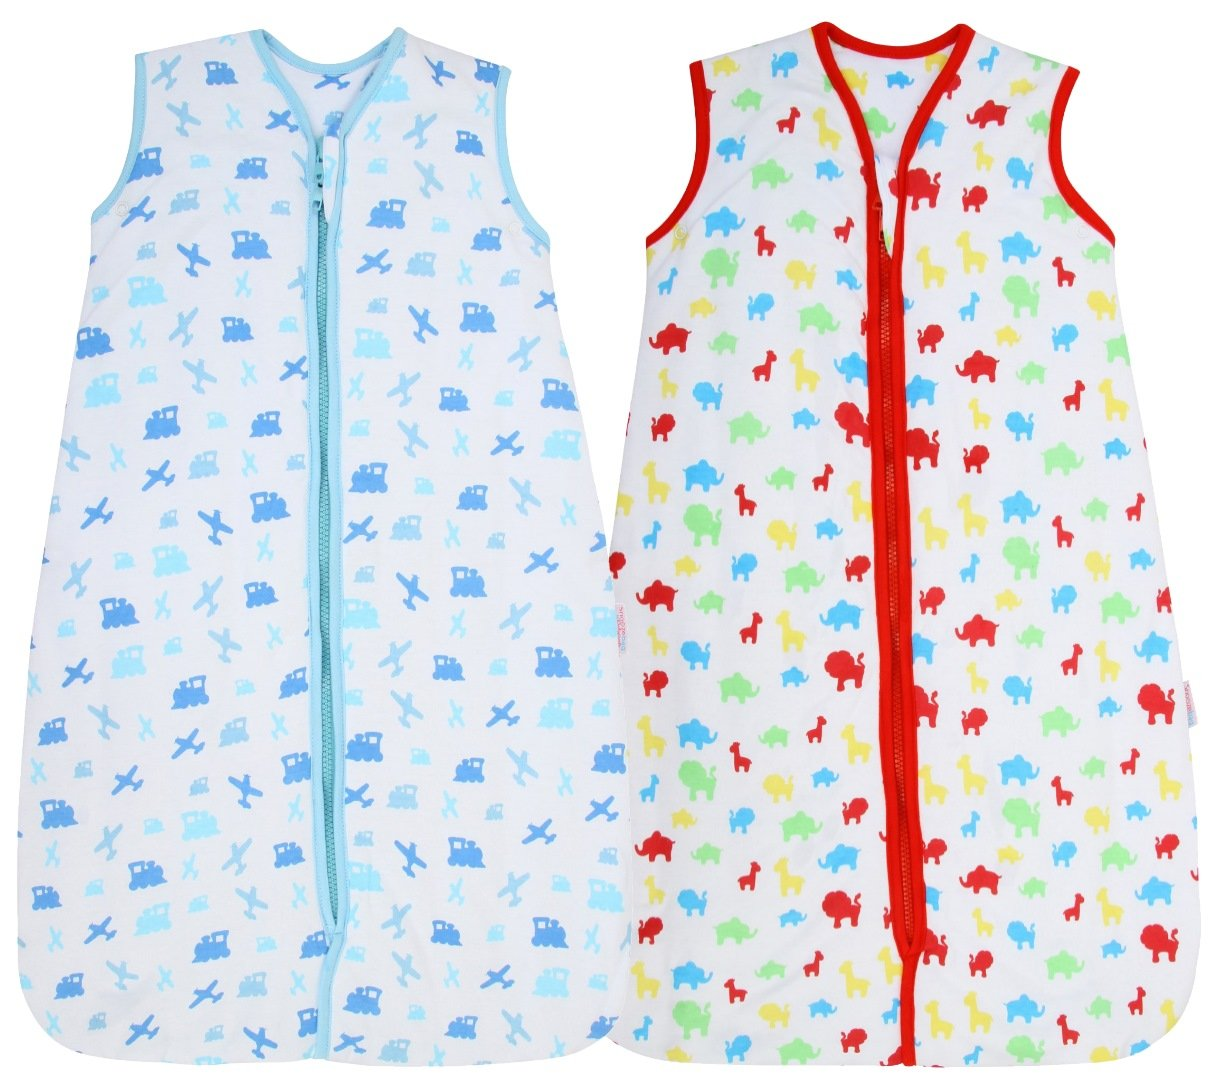 Snoozebag Twin Pack Planes & Trains + Jungle Fun 100% Cotton 2.5 Tog Boys Nursery Baby Sleeping Bag Multi-Coloured 18-36 Months (110cm) 2 pack Babycurls SB-TW-JN-BF